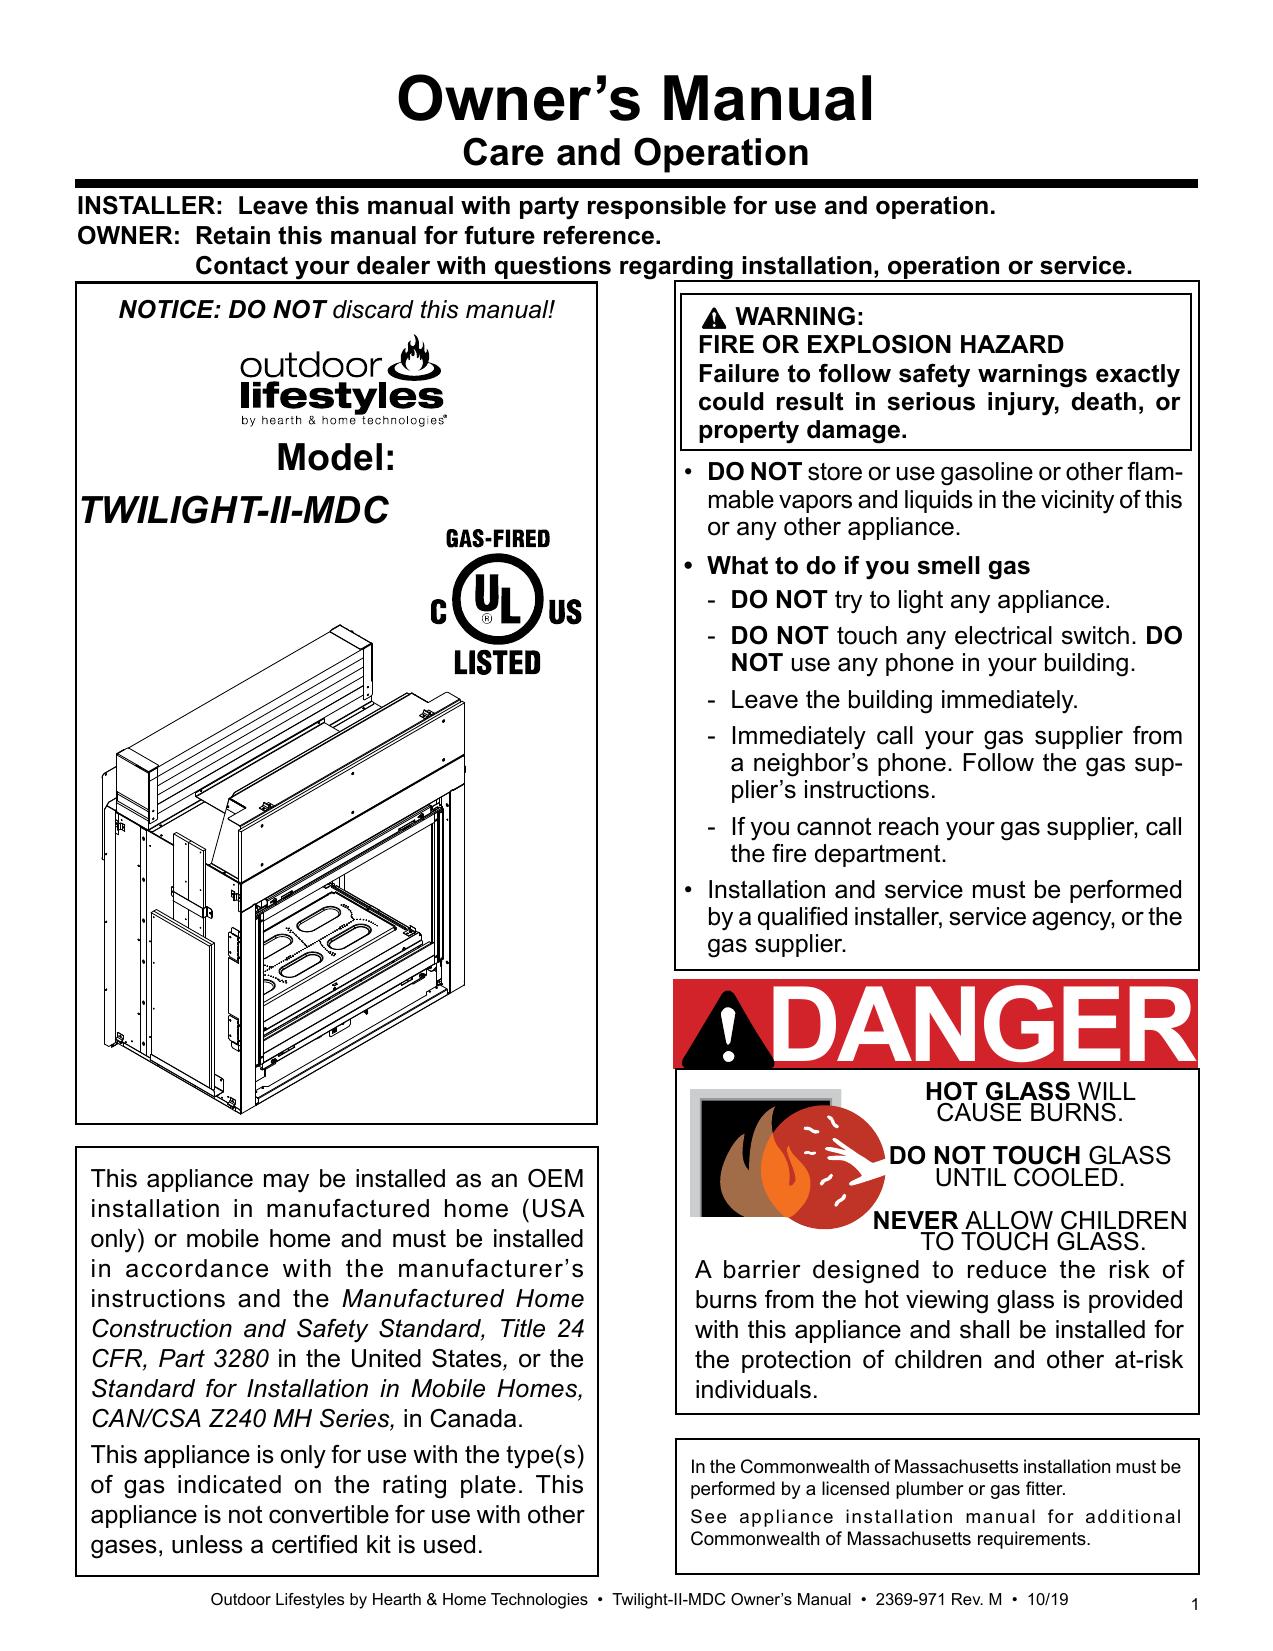 Quadrafire Twilight Modern Gas Fireplace User Manual Manualzz